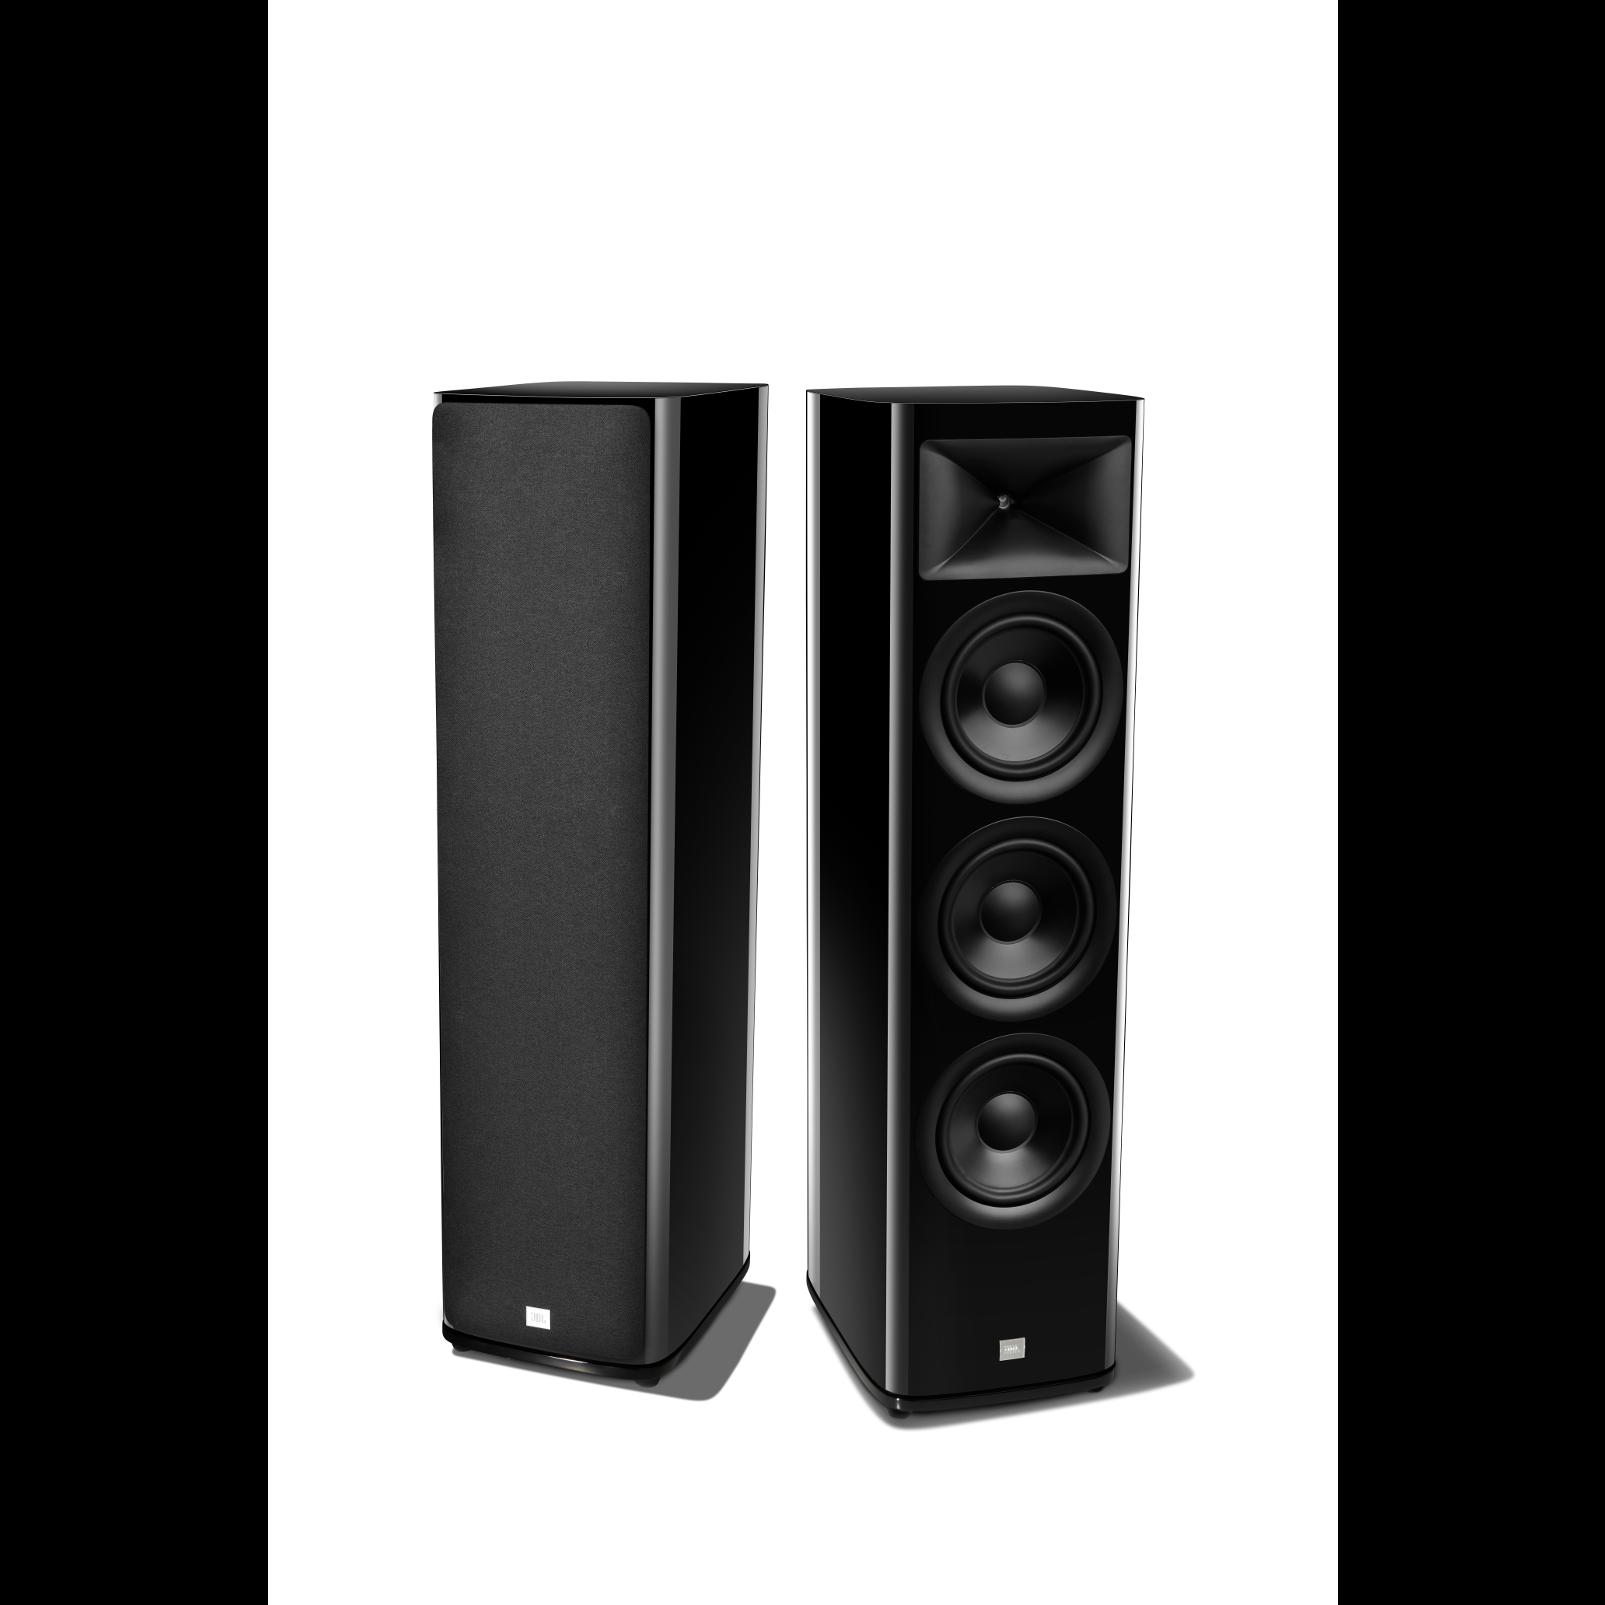 HDI-3800 - Black Gloss - 2 ½-way Triple 8-inch (200mm) Floorstanding Loudspeaker - Detailshot 1